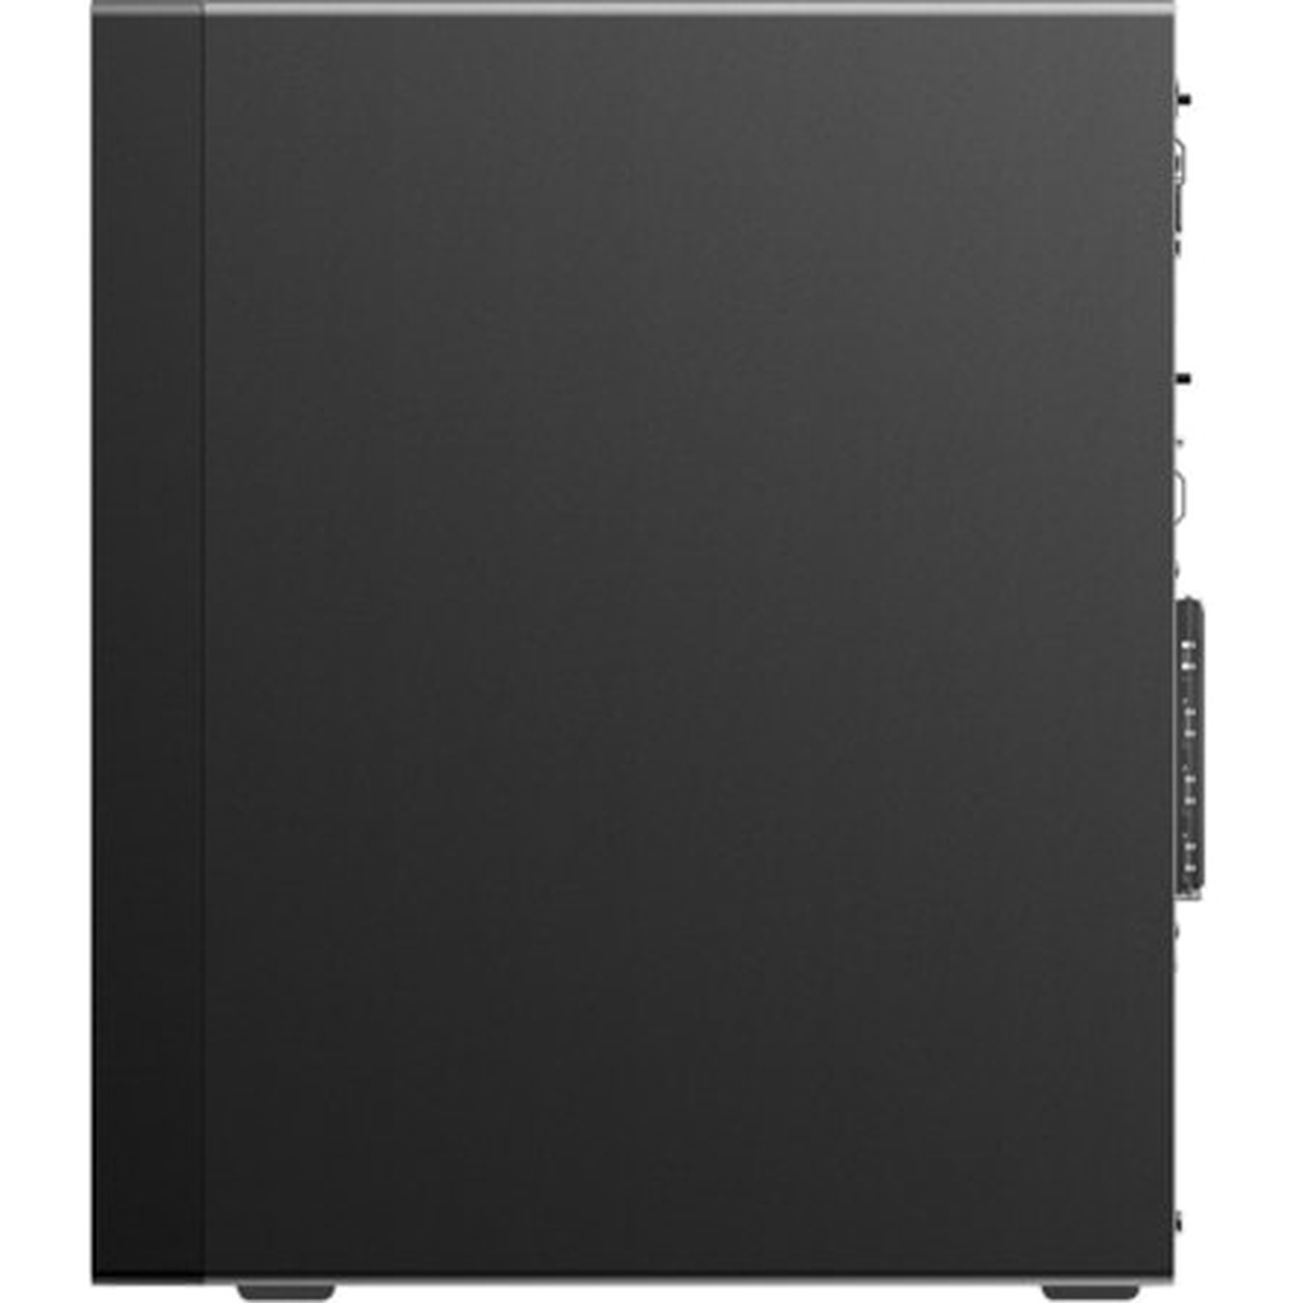 Lenovo ThinkStation P330 30CYS0UG00 Workstation - 1 x Xeon E-2224 - 32 GB RAM - 1 TB SSD - Tower